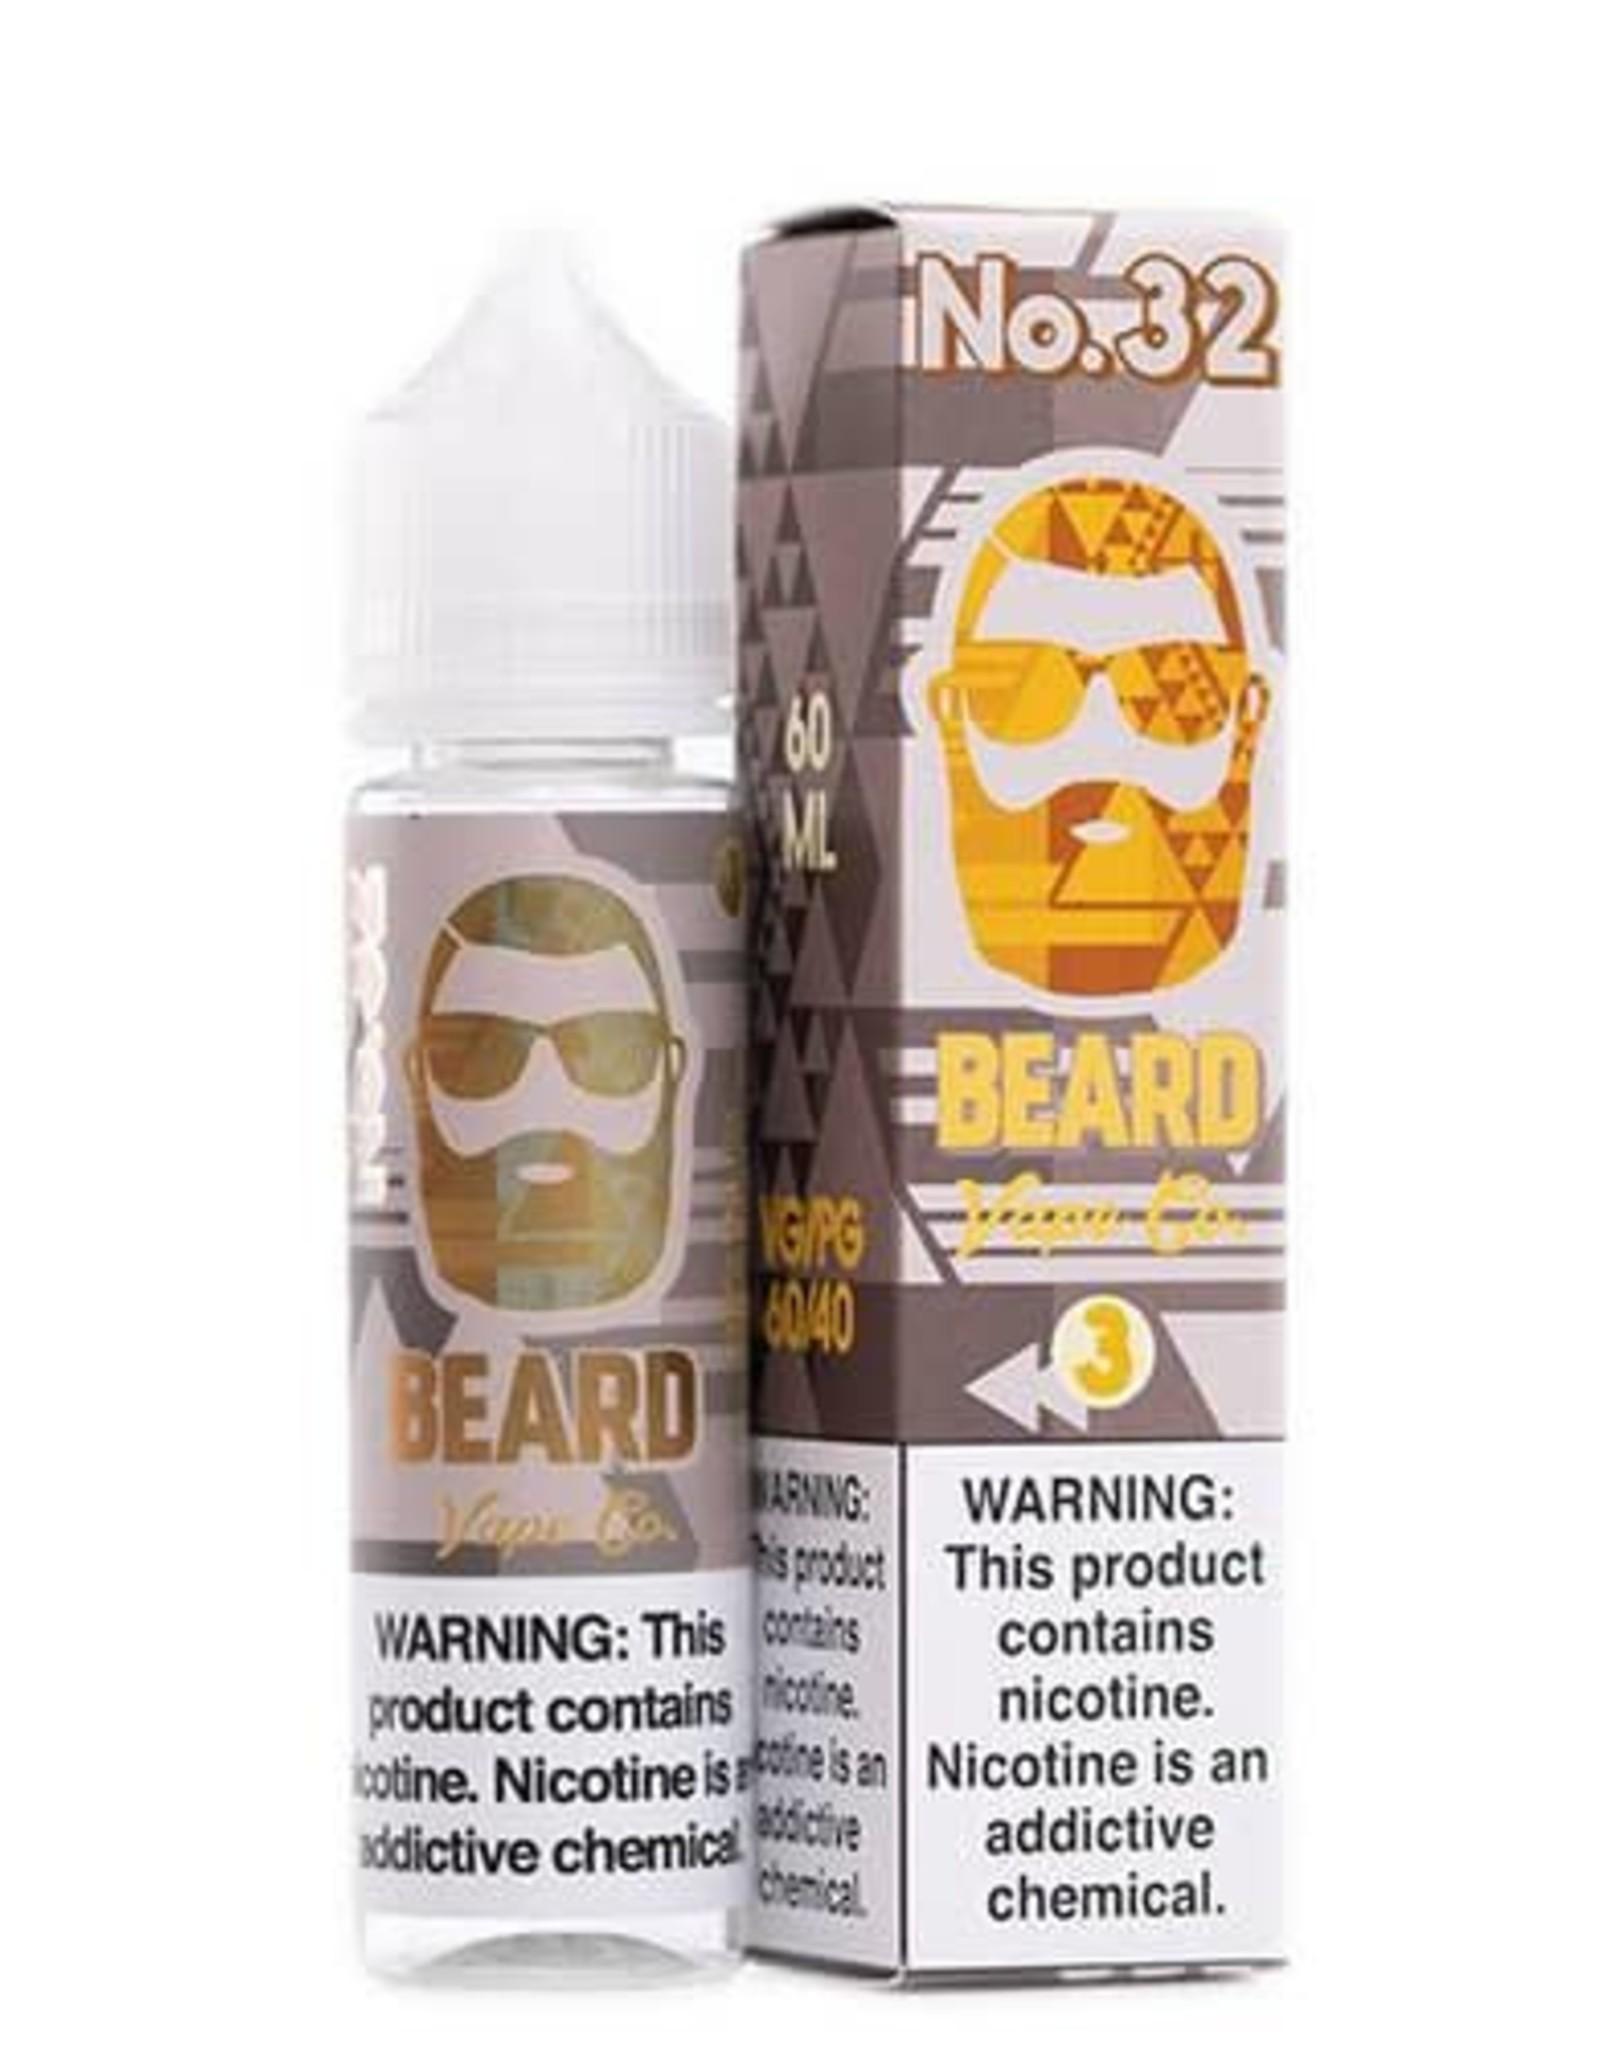 Beard Beard - No. 32 60ml